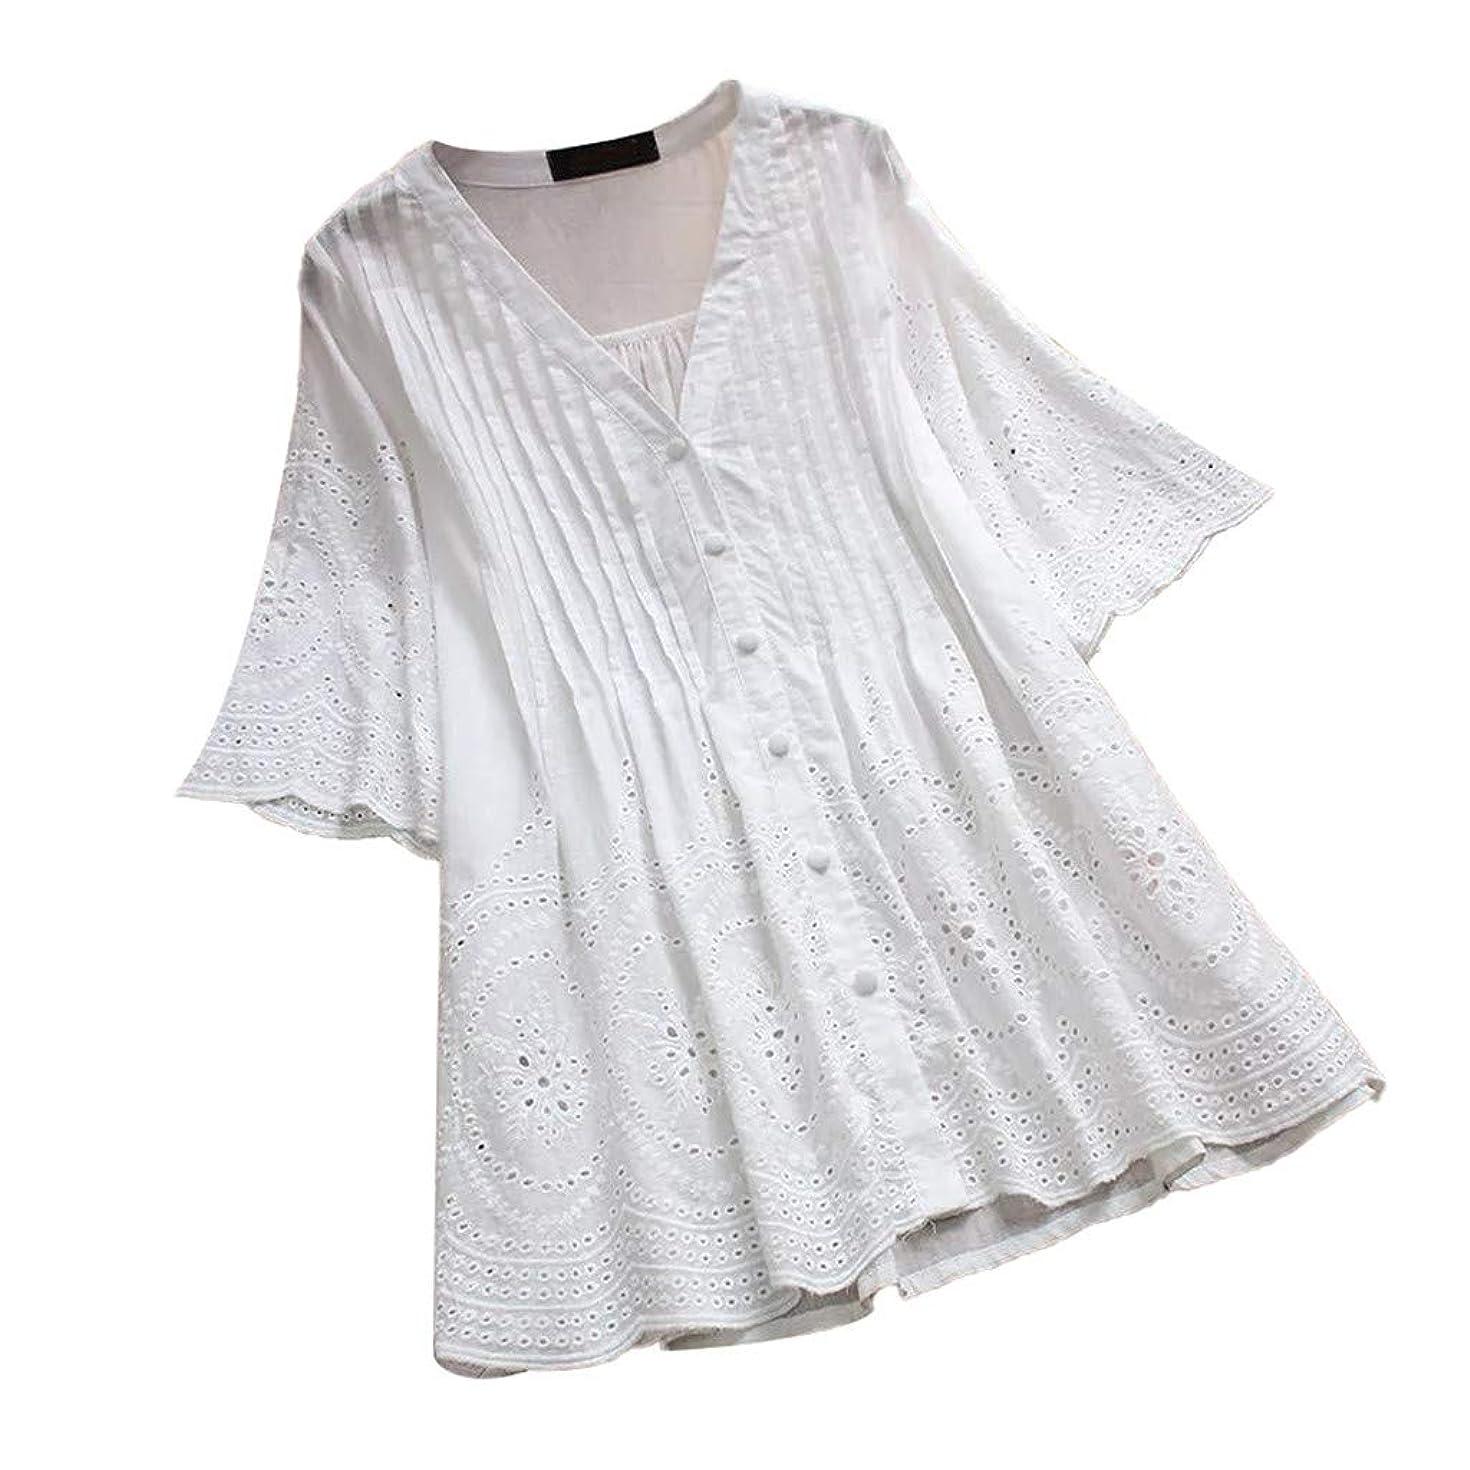 Cewtolkar Women Shirt Button Blouse Hollow Tops Ruffle Tees Half Sleeve Tunic V Neck T Shirt Summer Top Plus Size